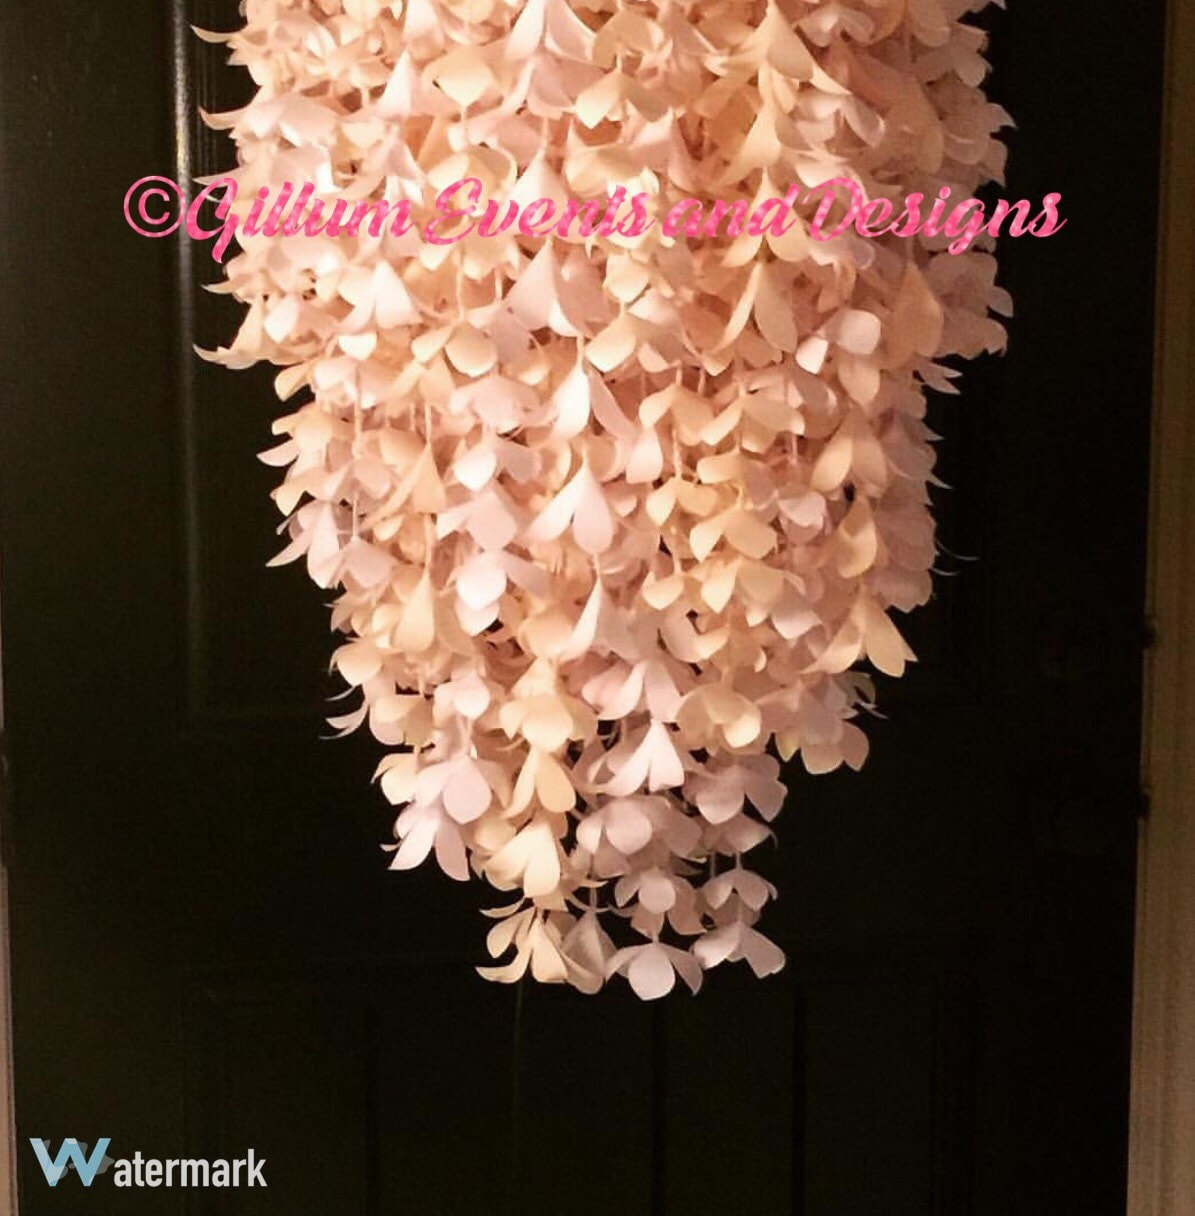 Paper flower chandelier acurnamedia paper flower chandelier aloadofball Image collections